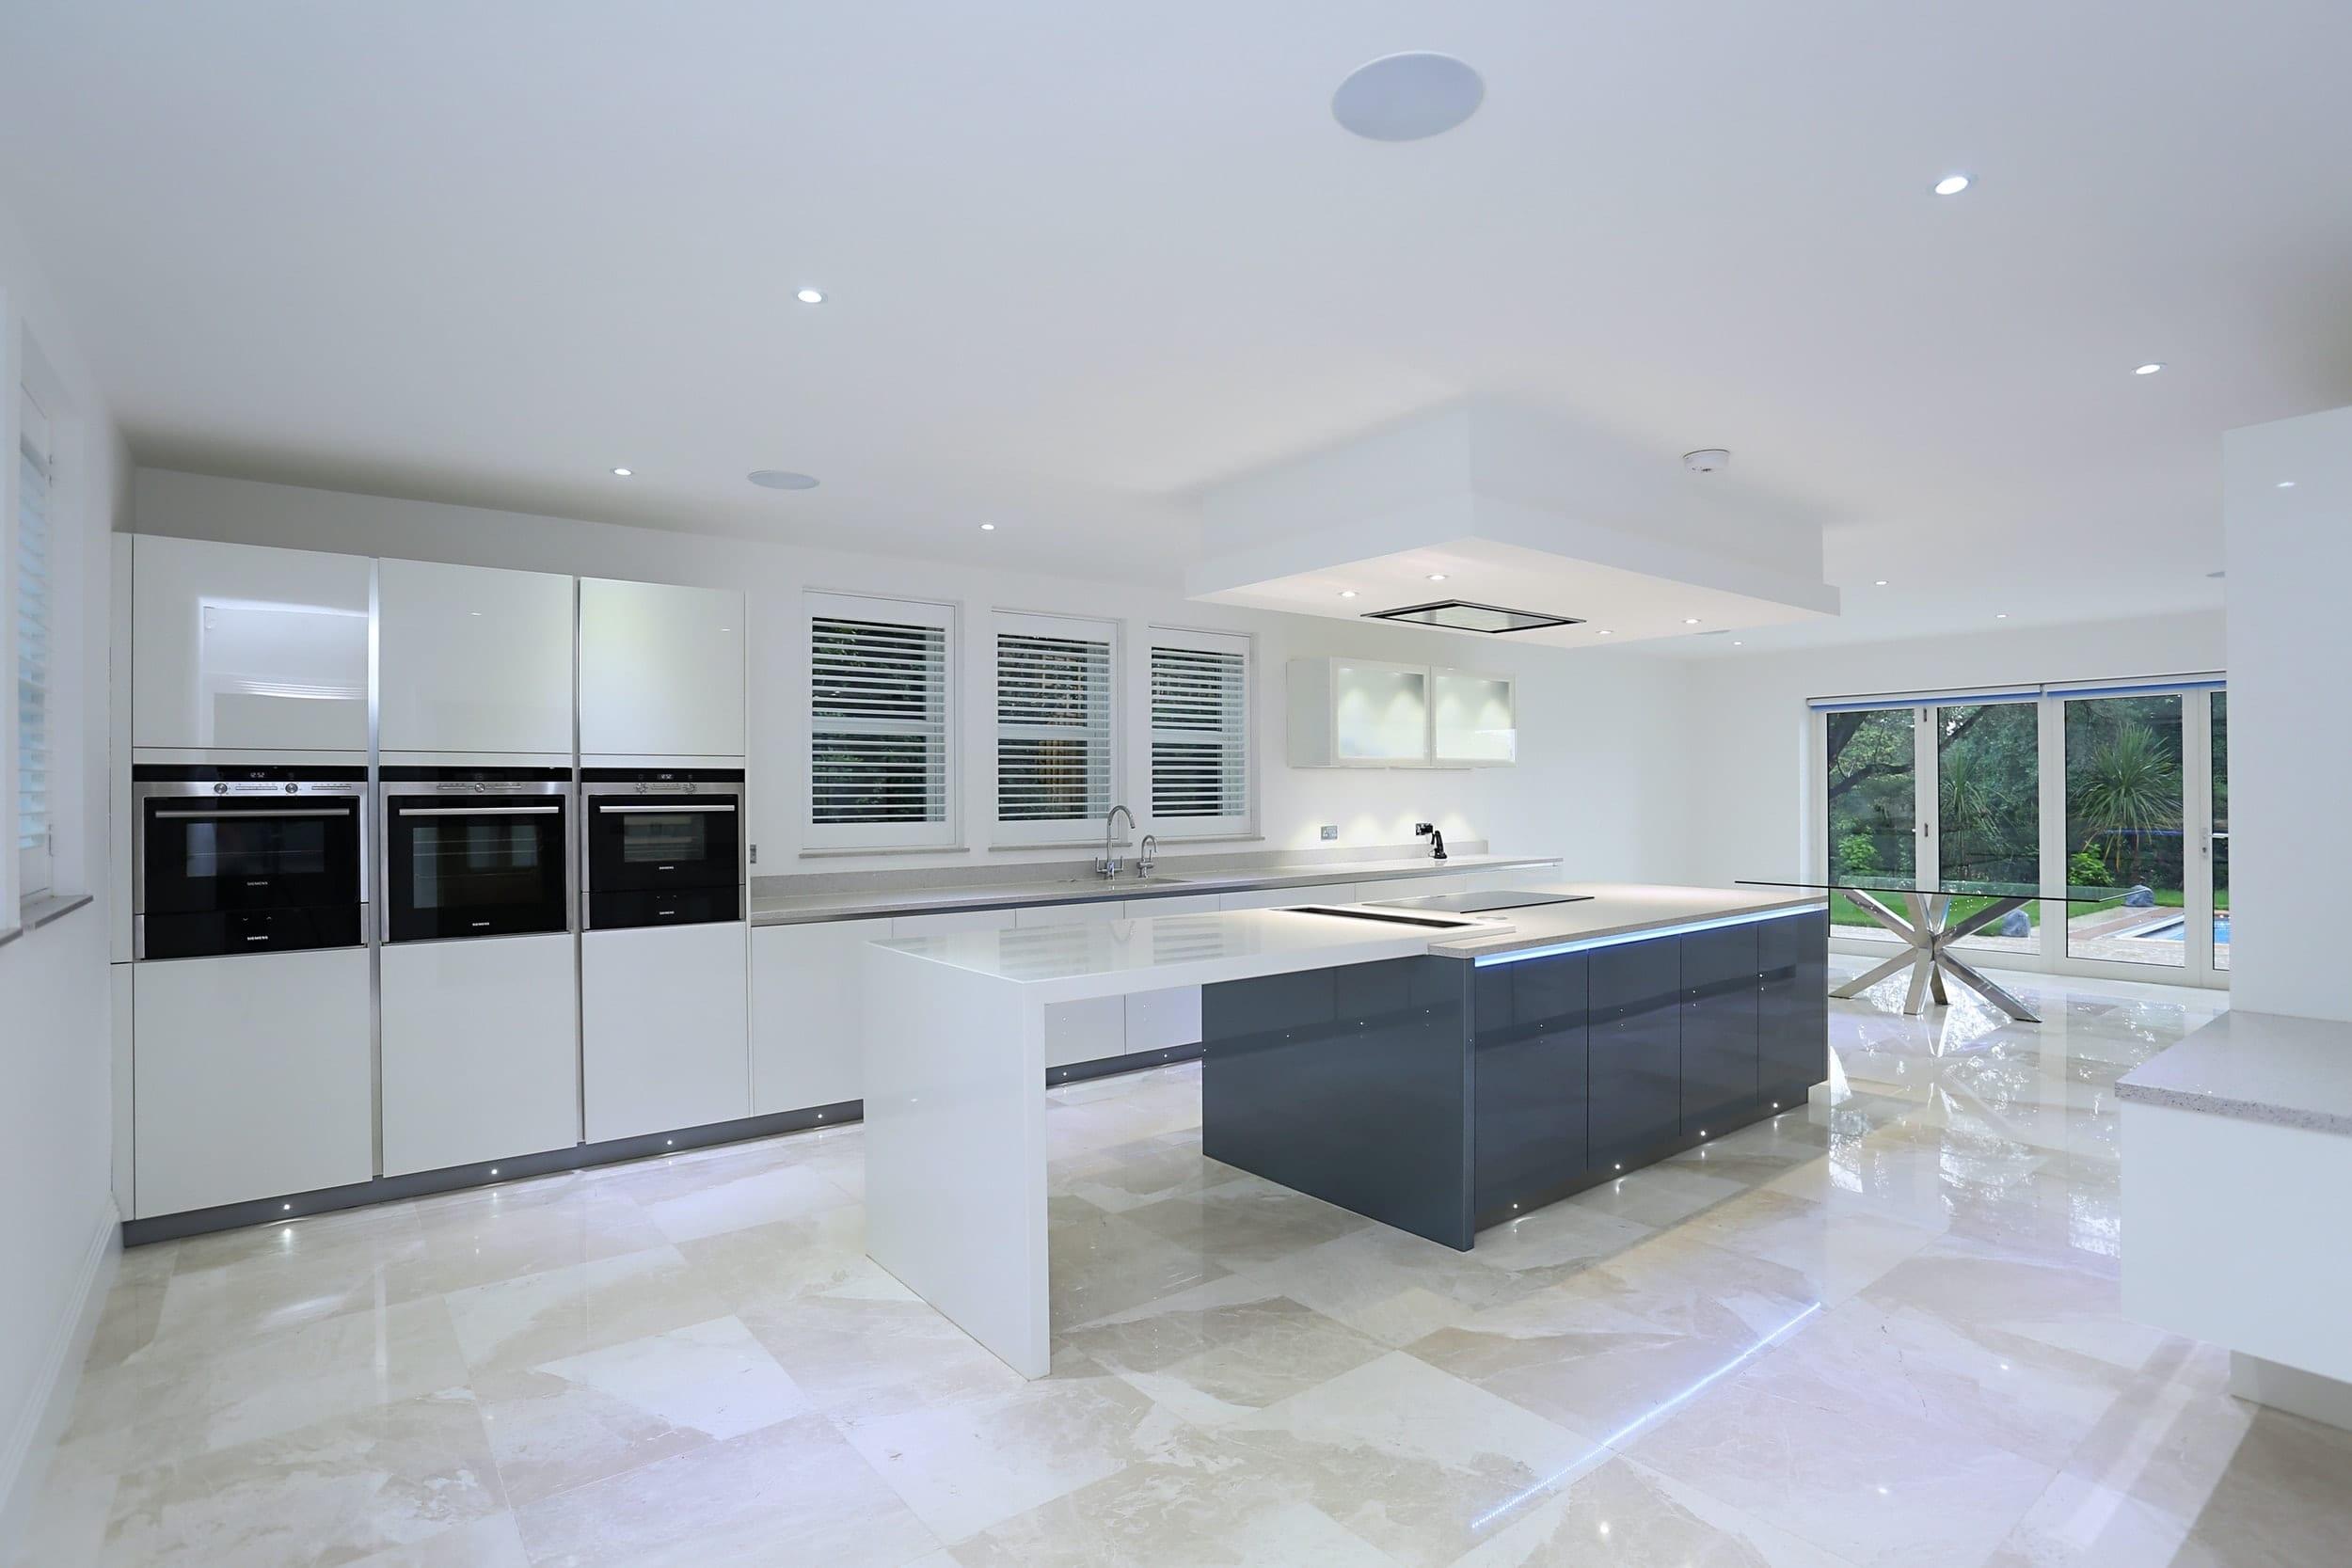 1. Handleless glass kitchen design 1 - Wooden Heart of Weybridge